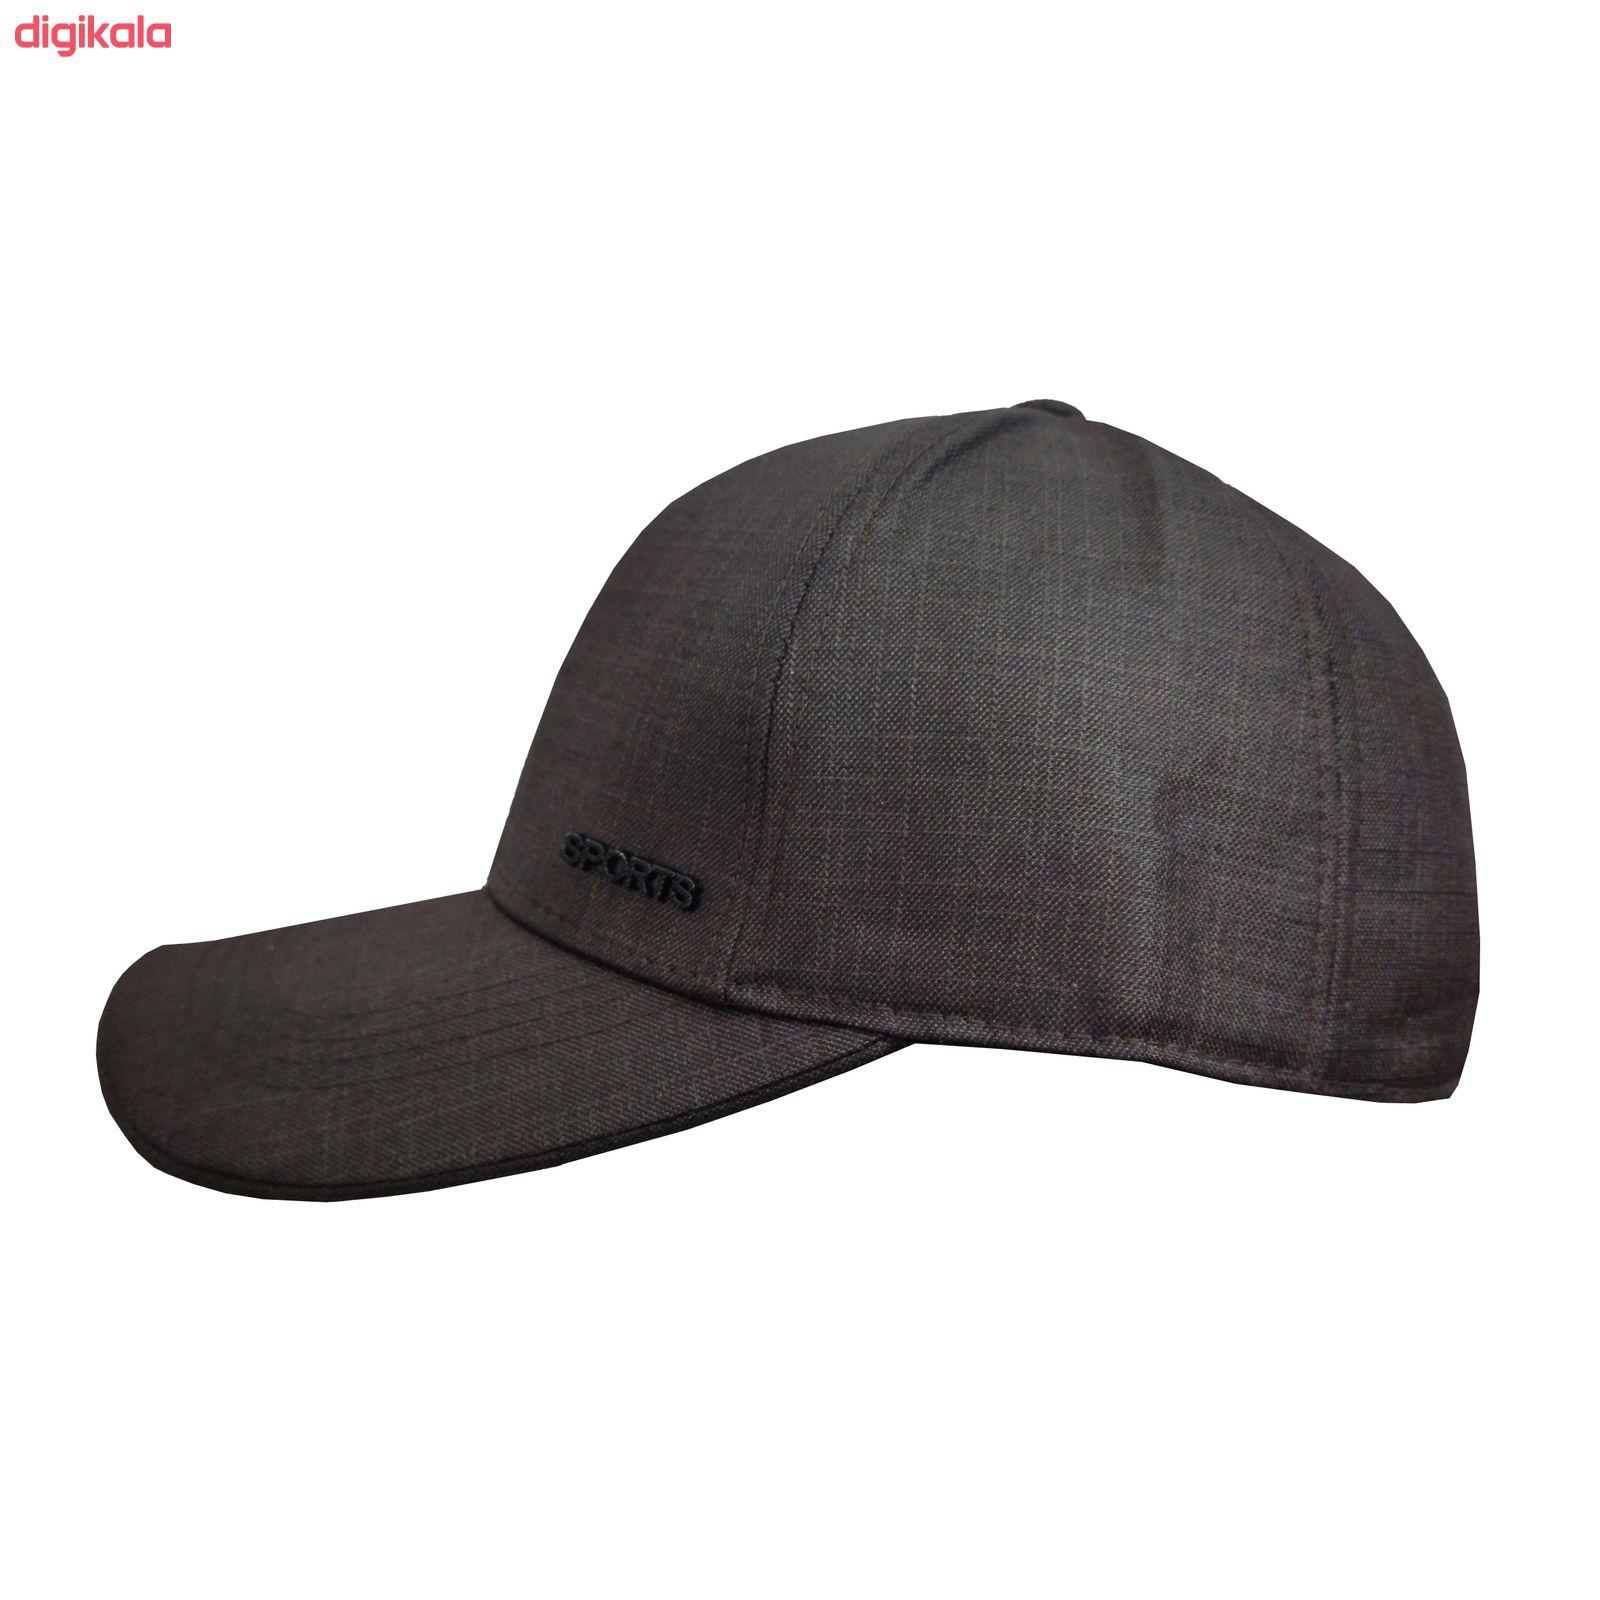 کلاه کپ کد LEY-SPO-30208 main 1 6